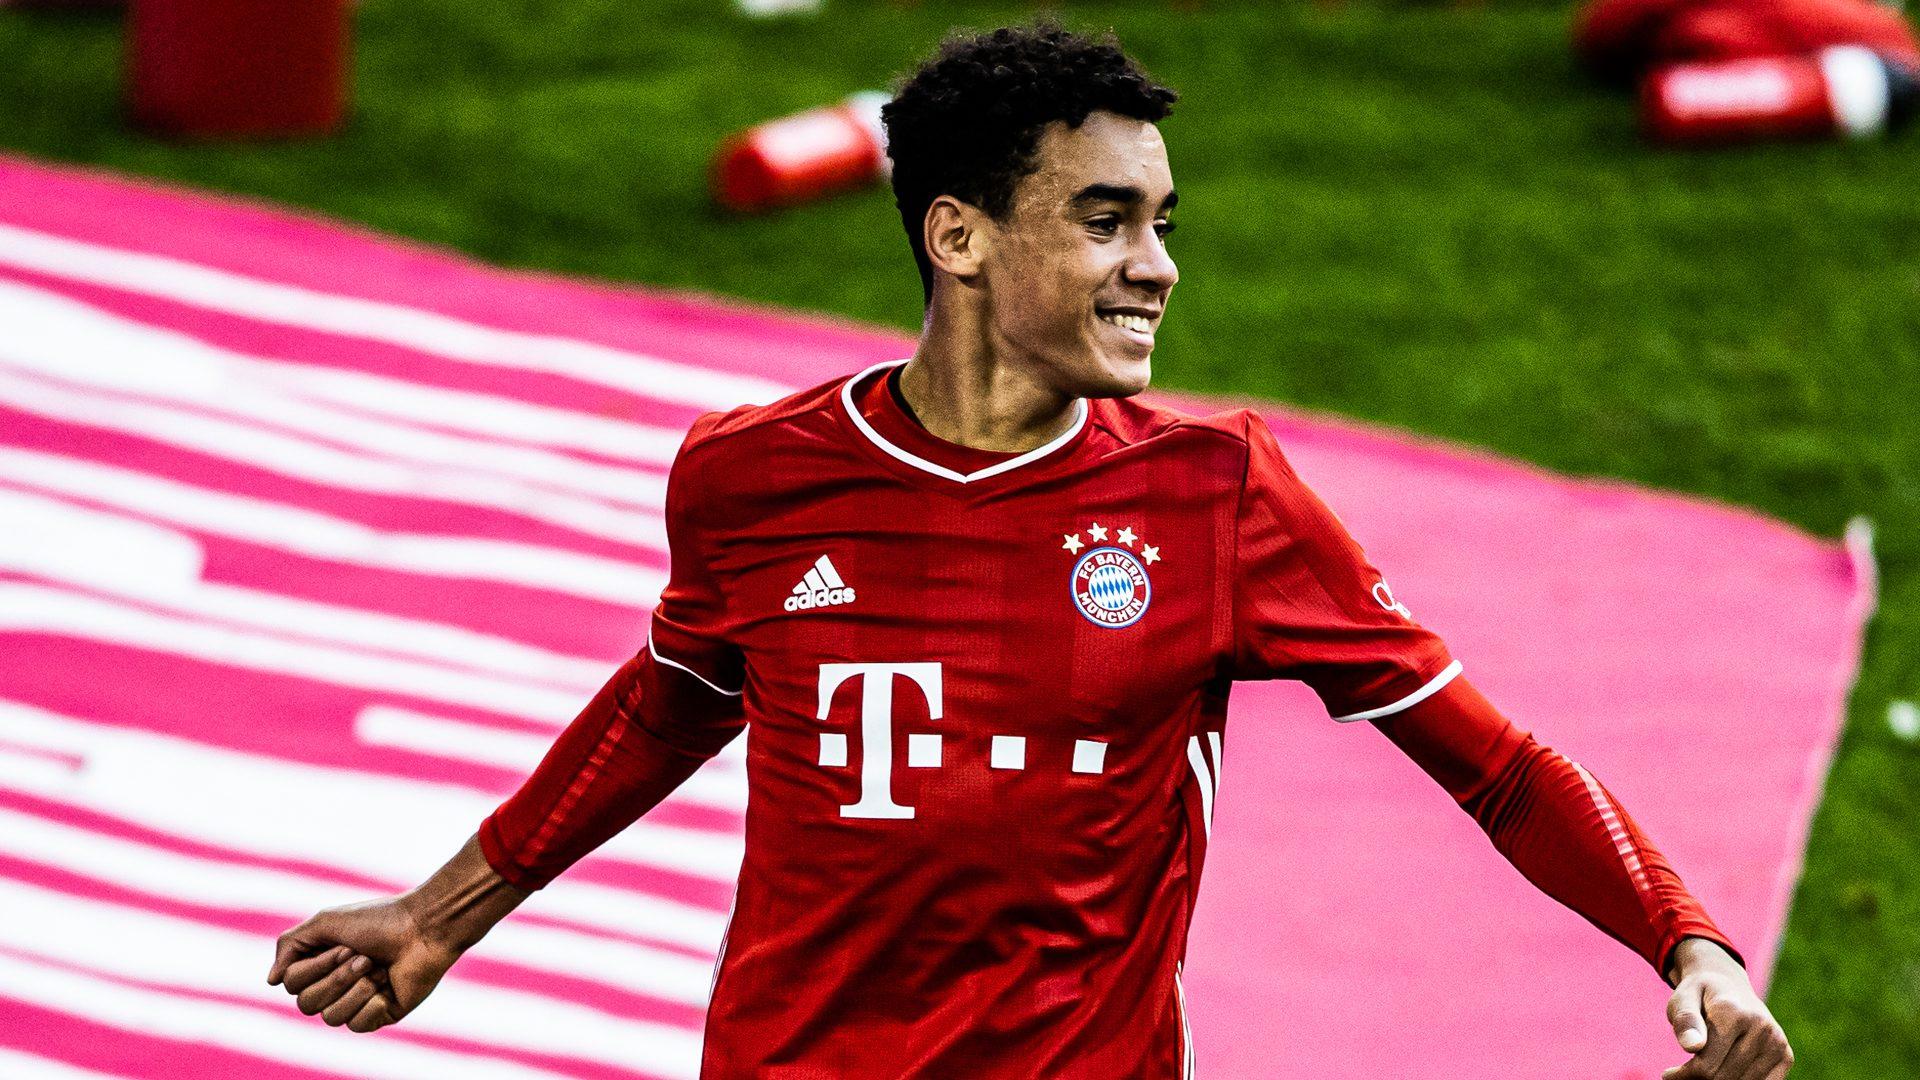 Bundesliga | Jamal Musiala: who is Bayern Munich's half-English,  half-German star of the future?